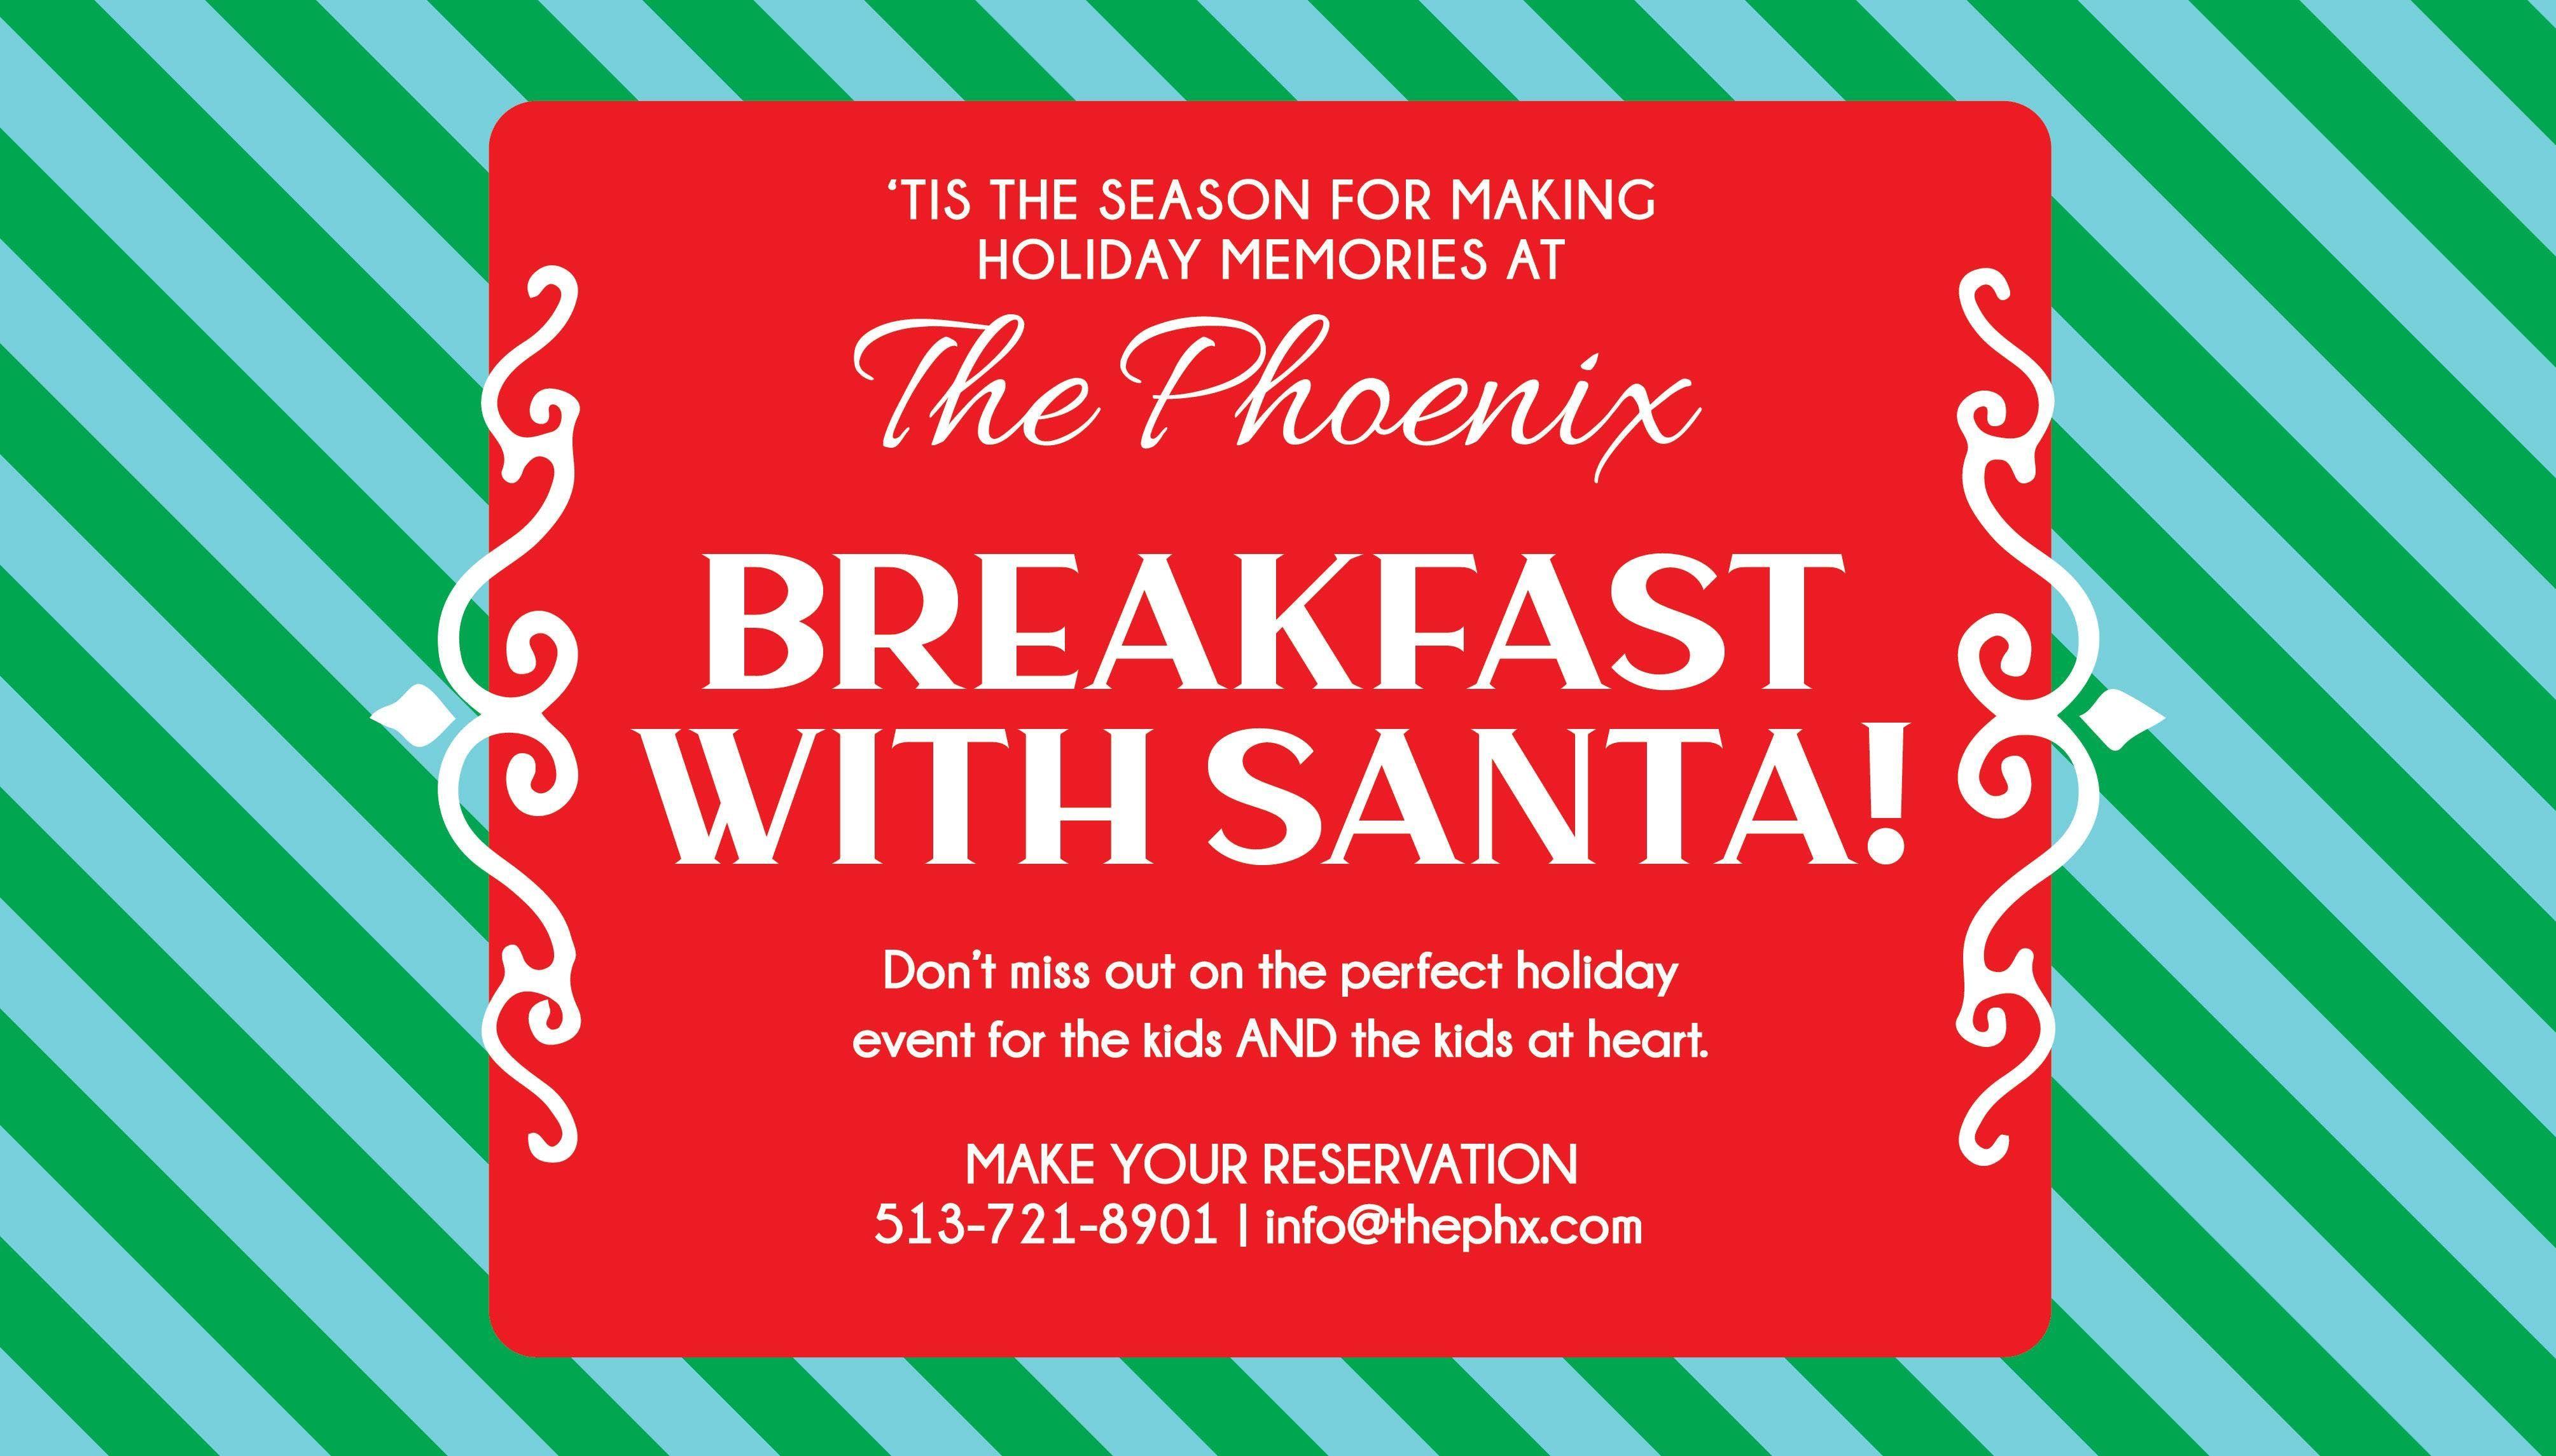 Breakfast with Santa at The Phoenix